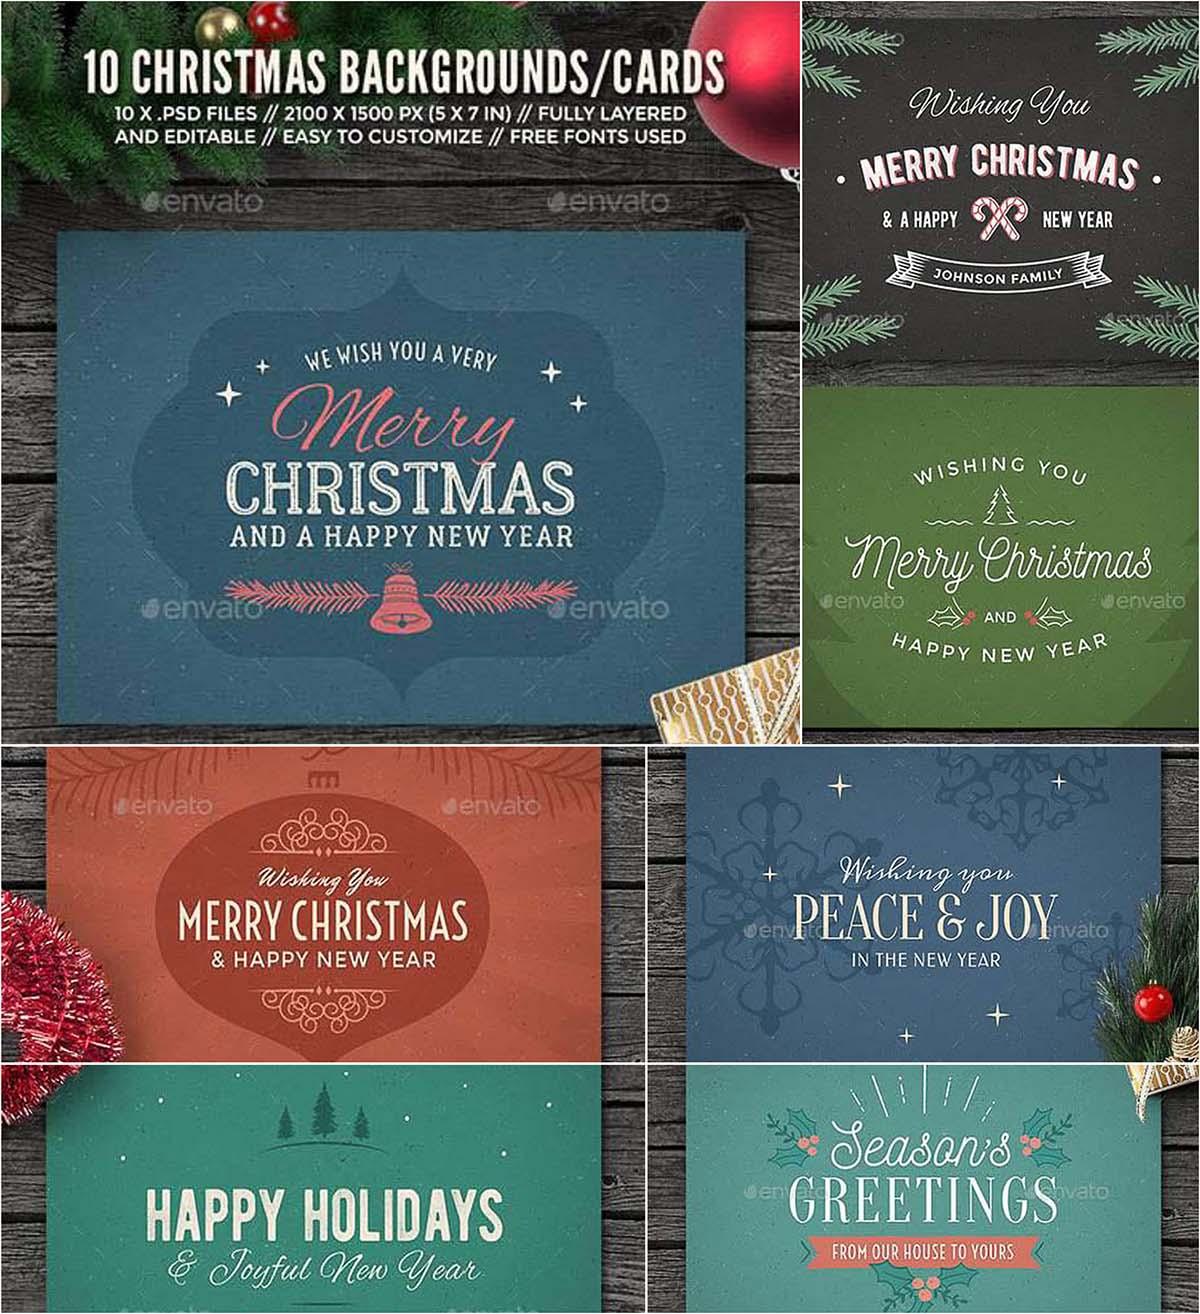 10 Christmas background cards set